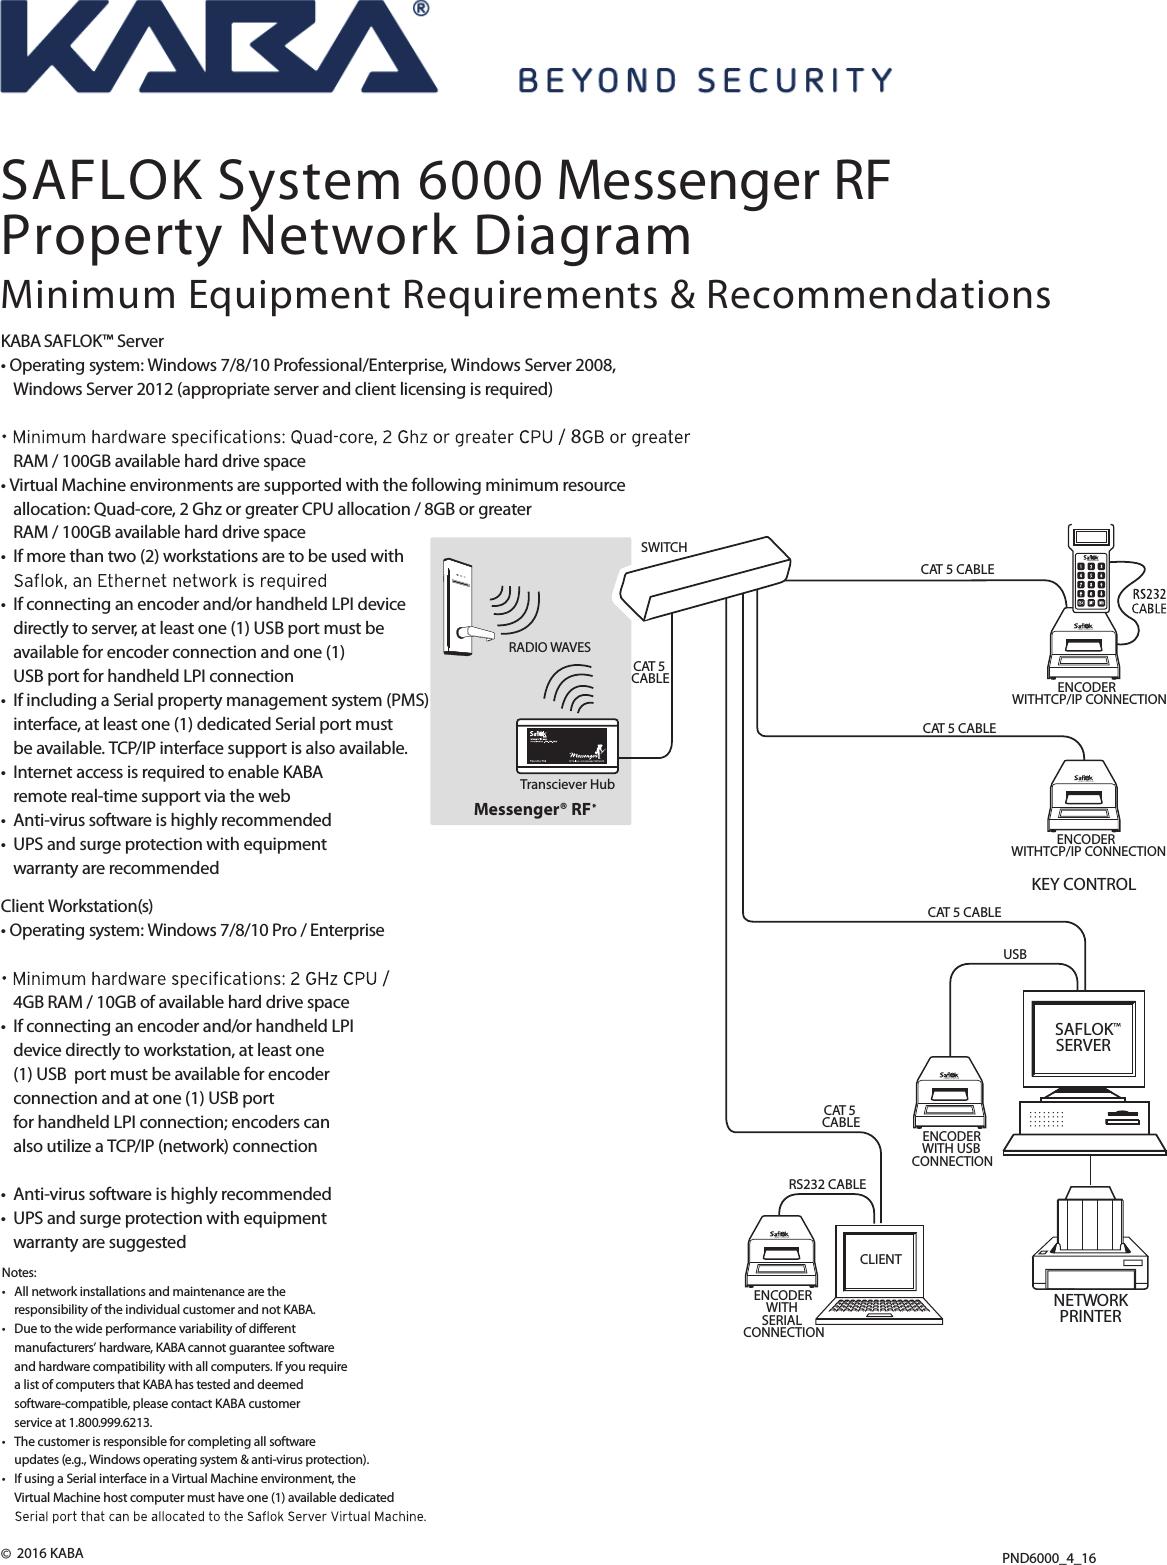 Saflok Wiring Diagram Free Download Yale Gc030 Kaba Diagrams Wire Center U2022 Parts Catalog At